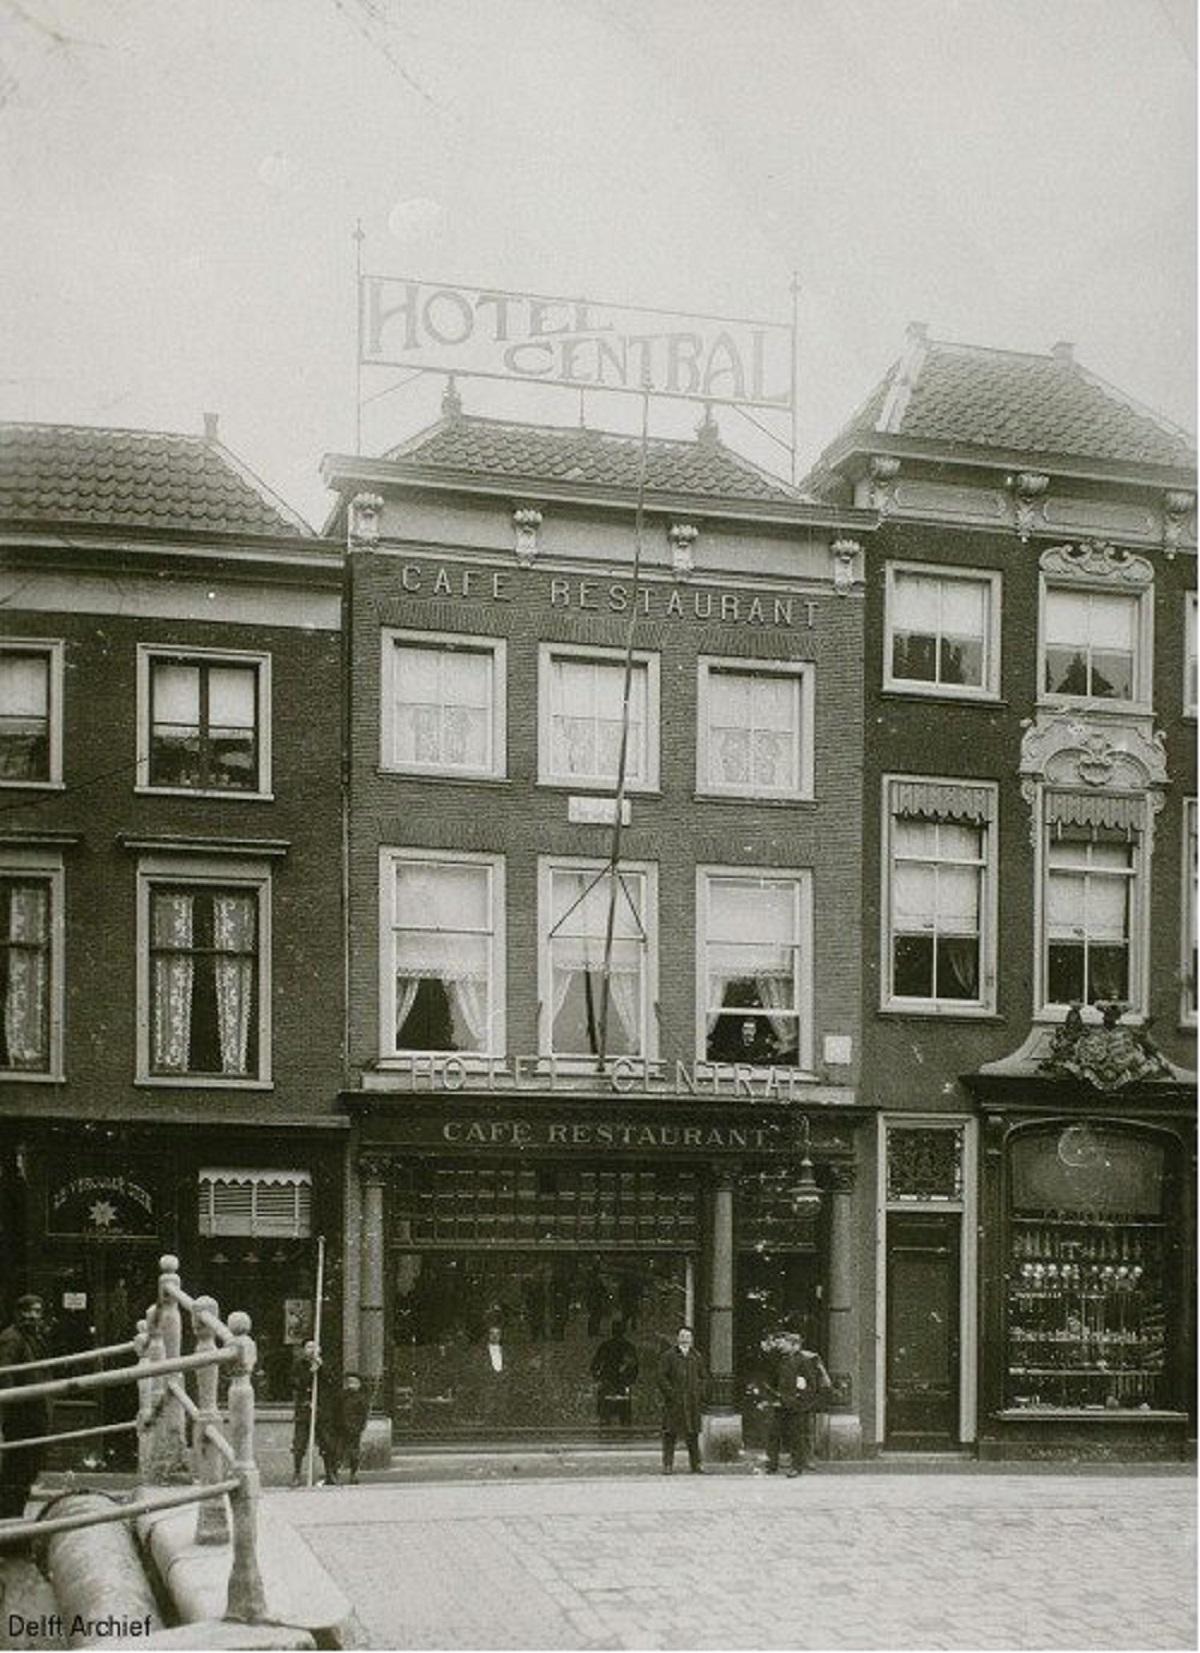 hotel central ca. 1898